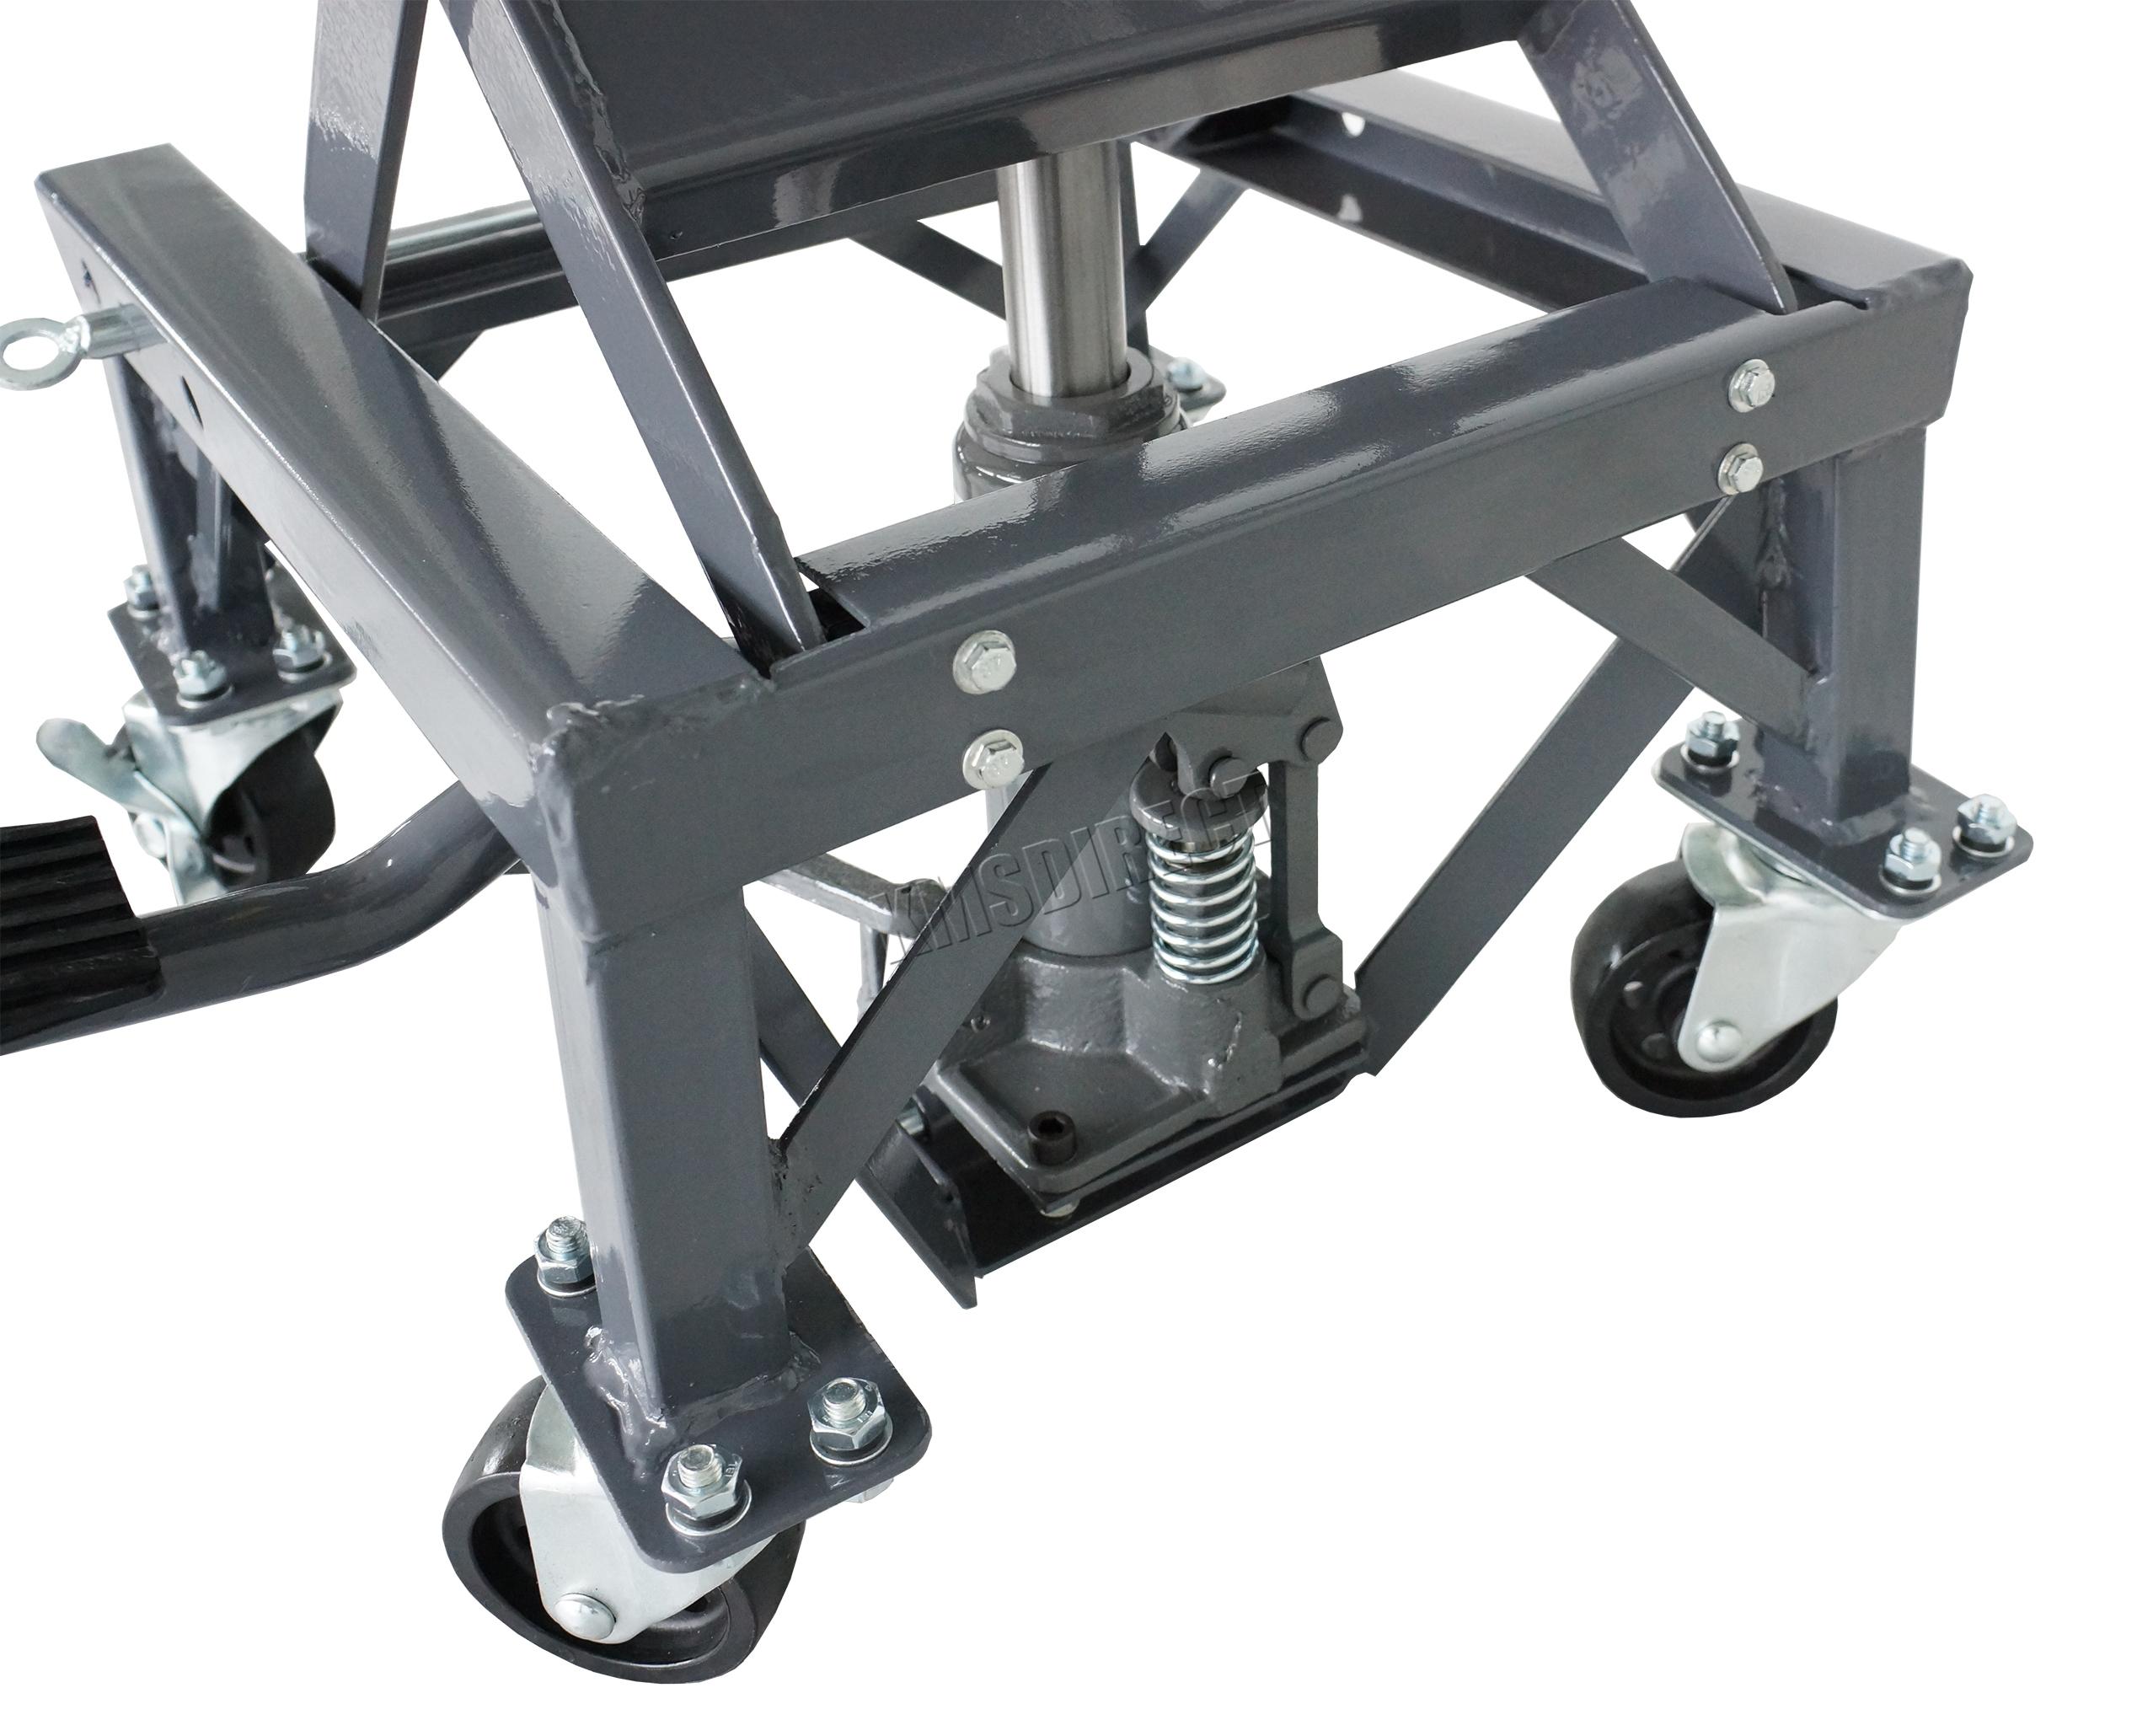 Hydraulic Motorcycle Lift : Hydraulic scissor lb bike motorcycle lift with wheel